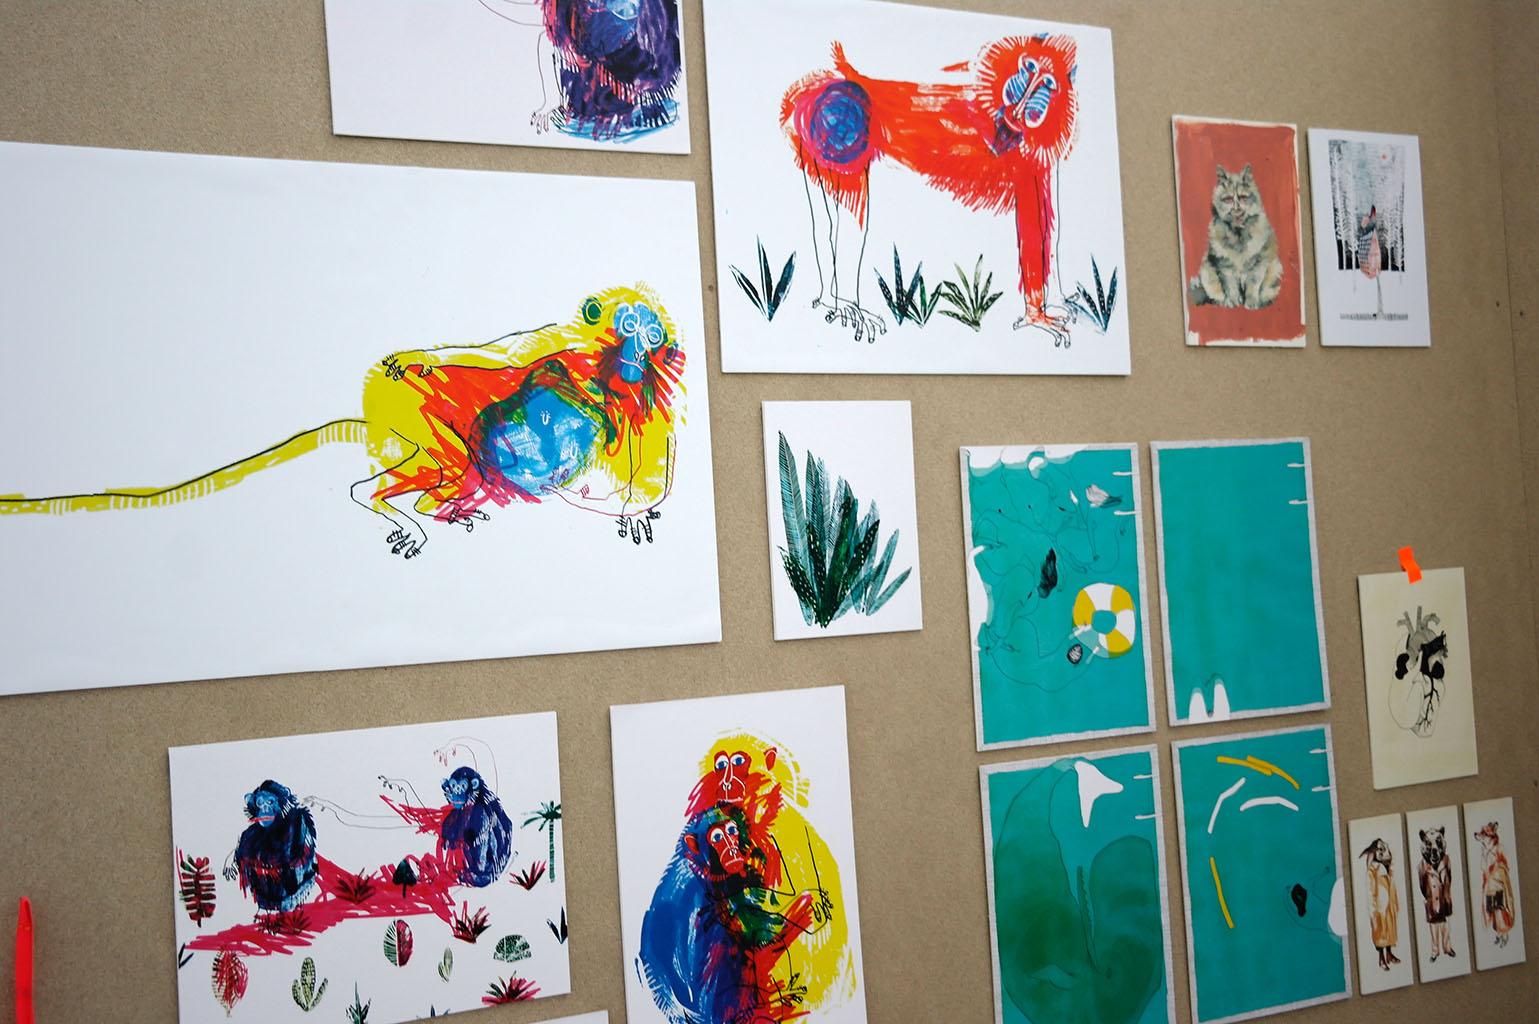 illu16-illustratoren-festival-köln-affen-skizzen-hans-christian-sanladerer